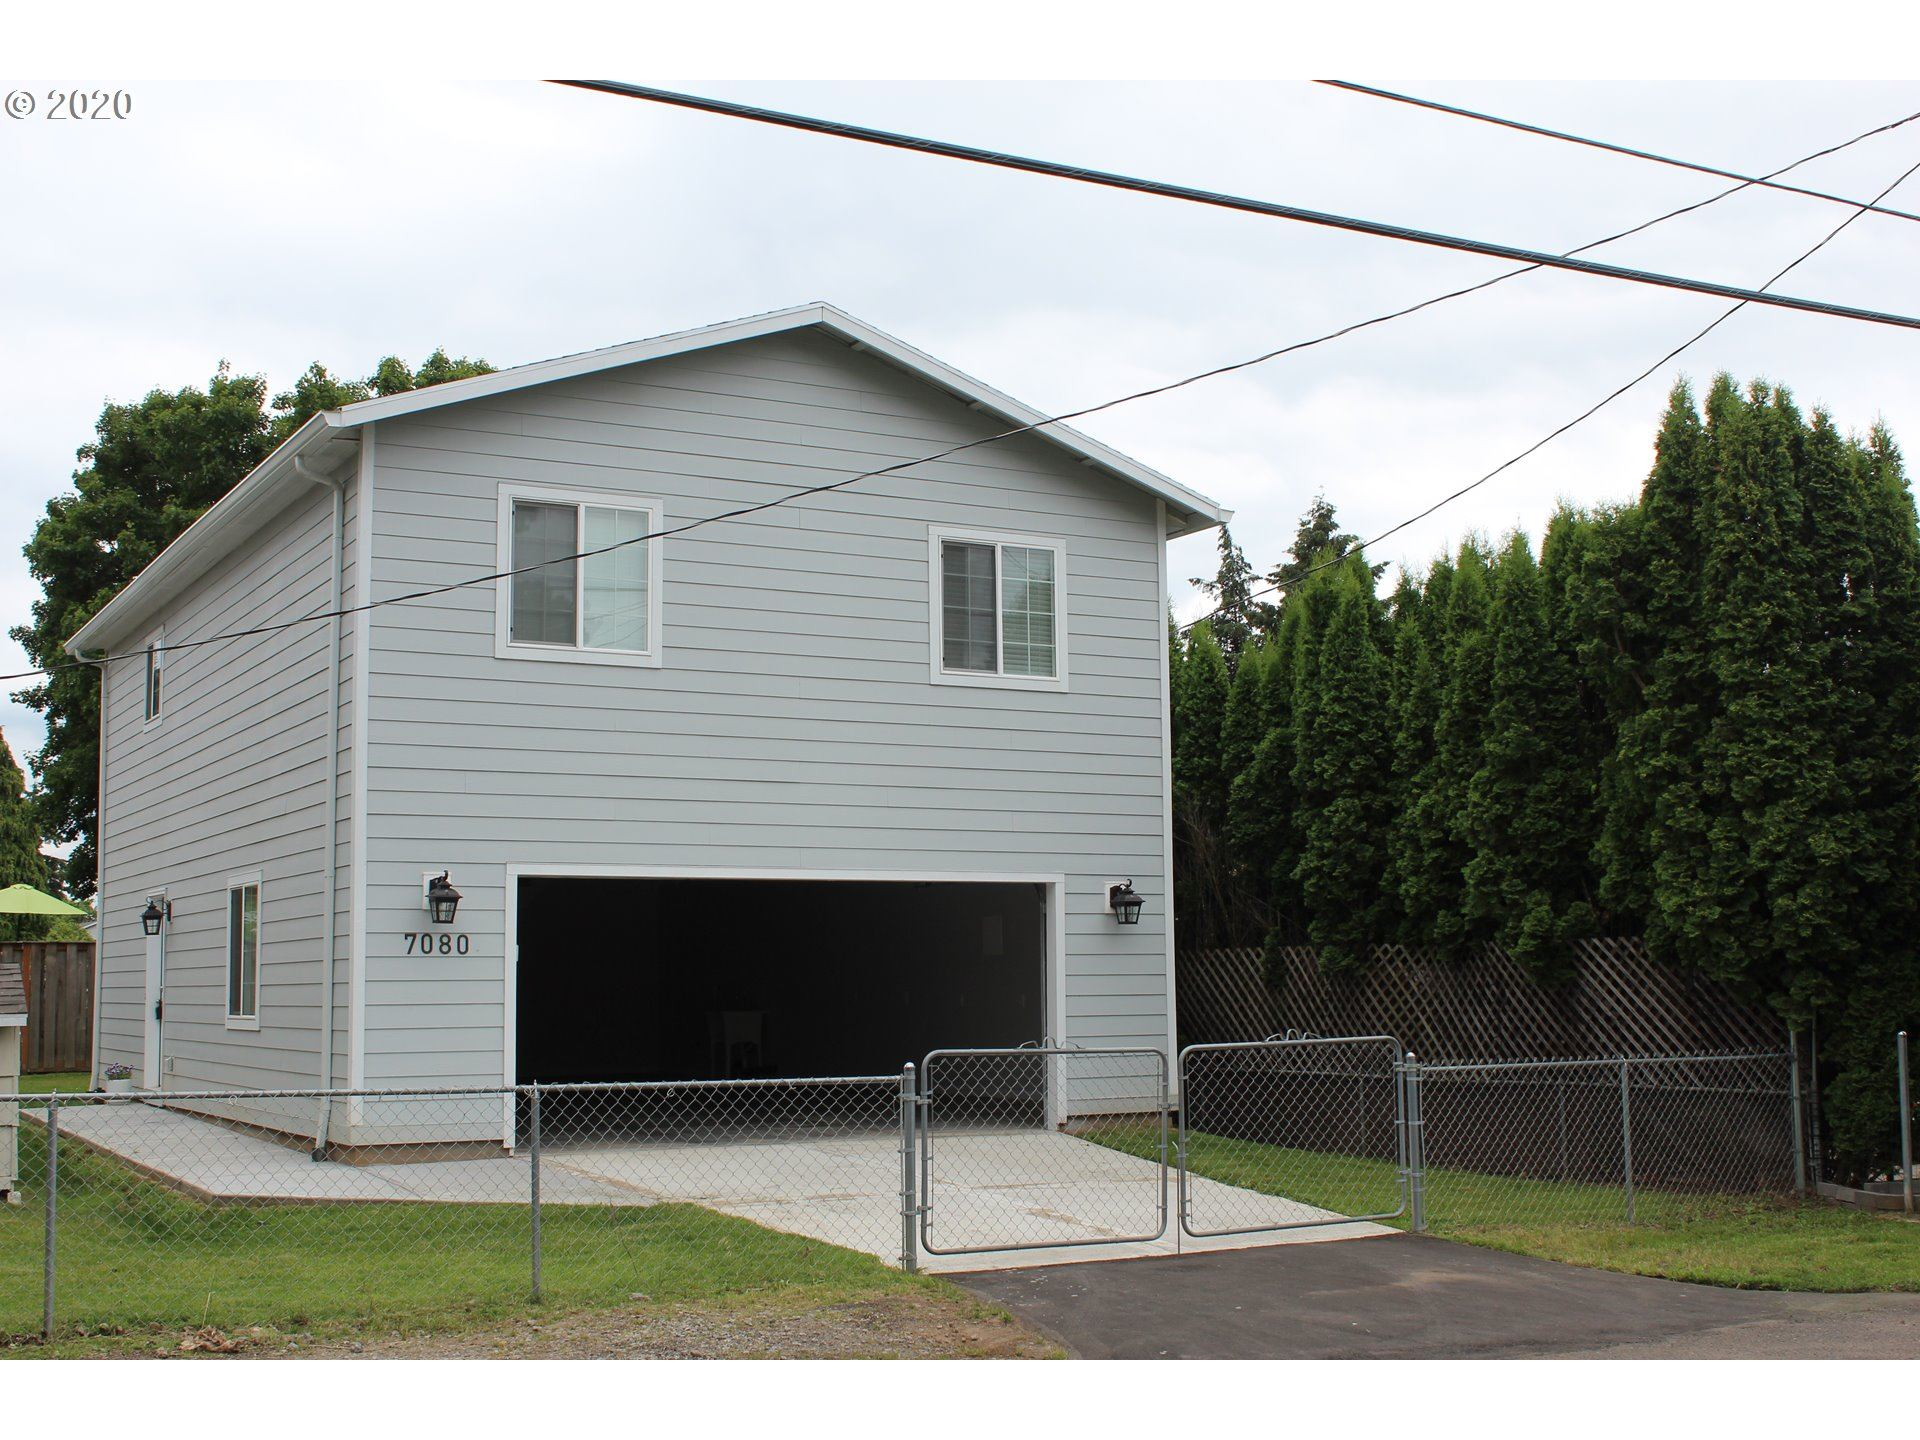 7205 SE 71ST AVE, Portland, OR 97206 - MLS#: 20327183